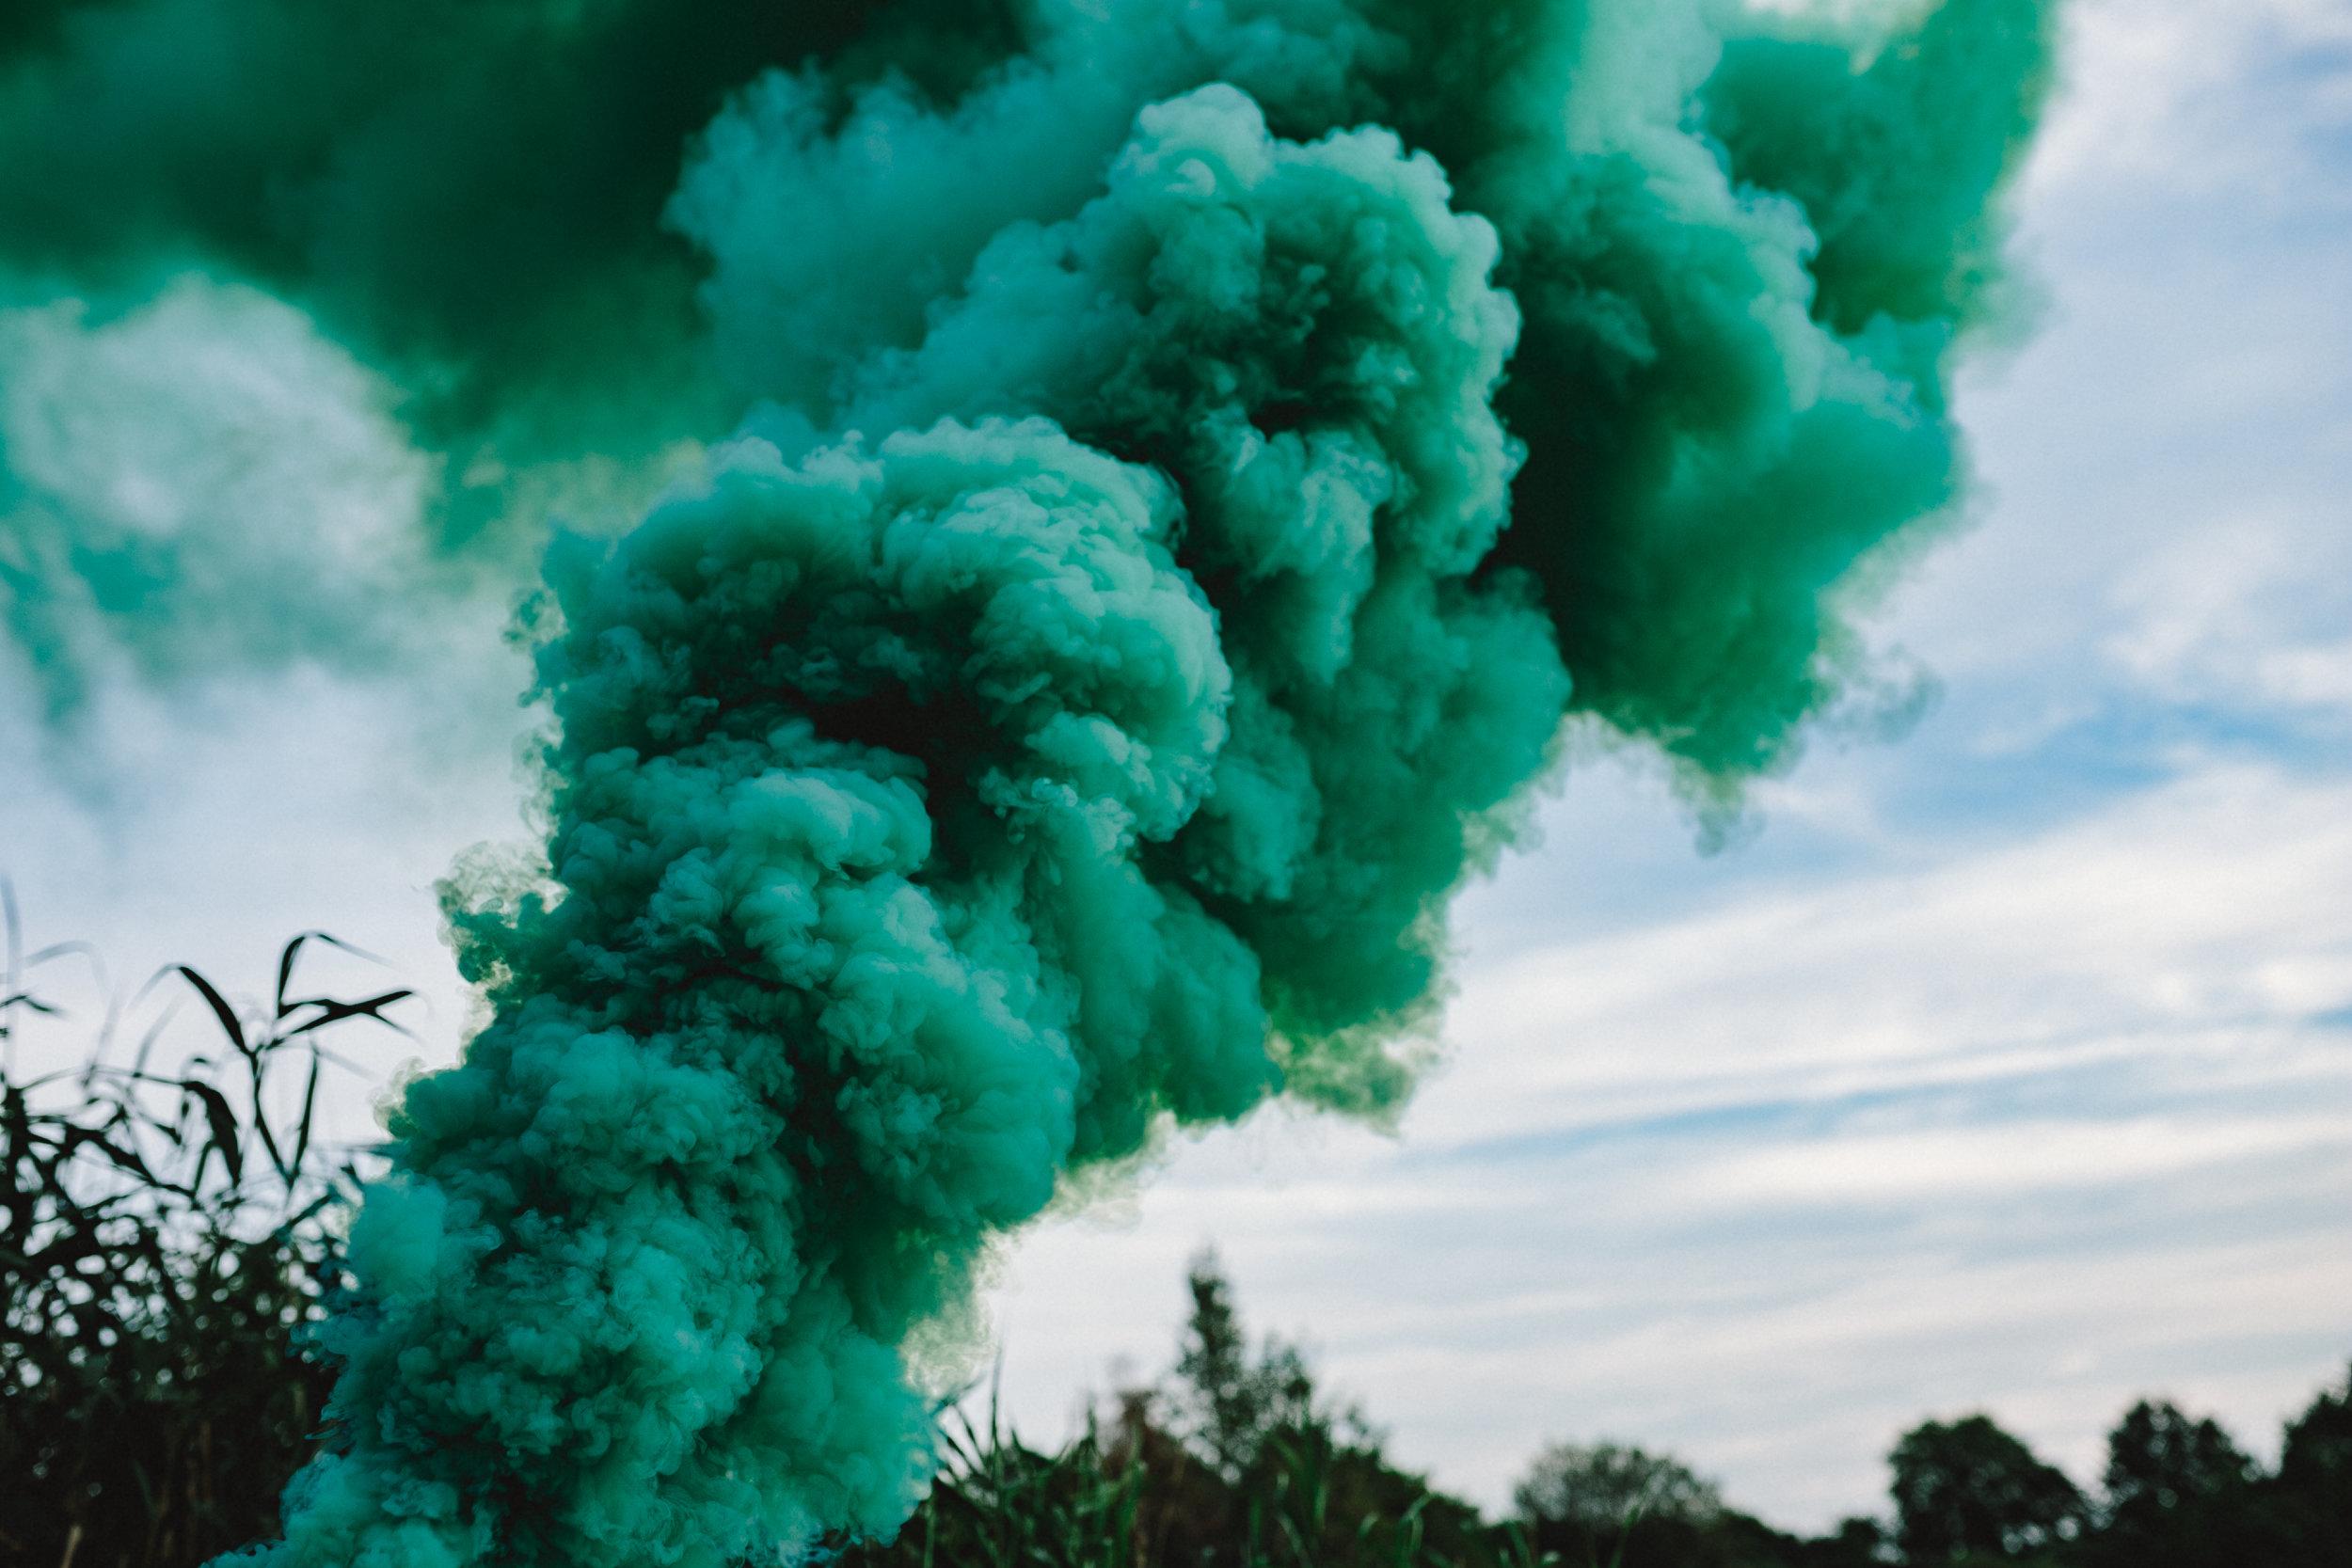 kaboompics_Green smoke bomb.jpg